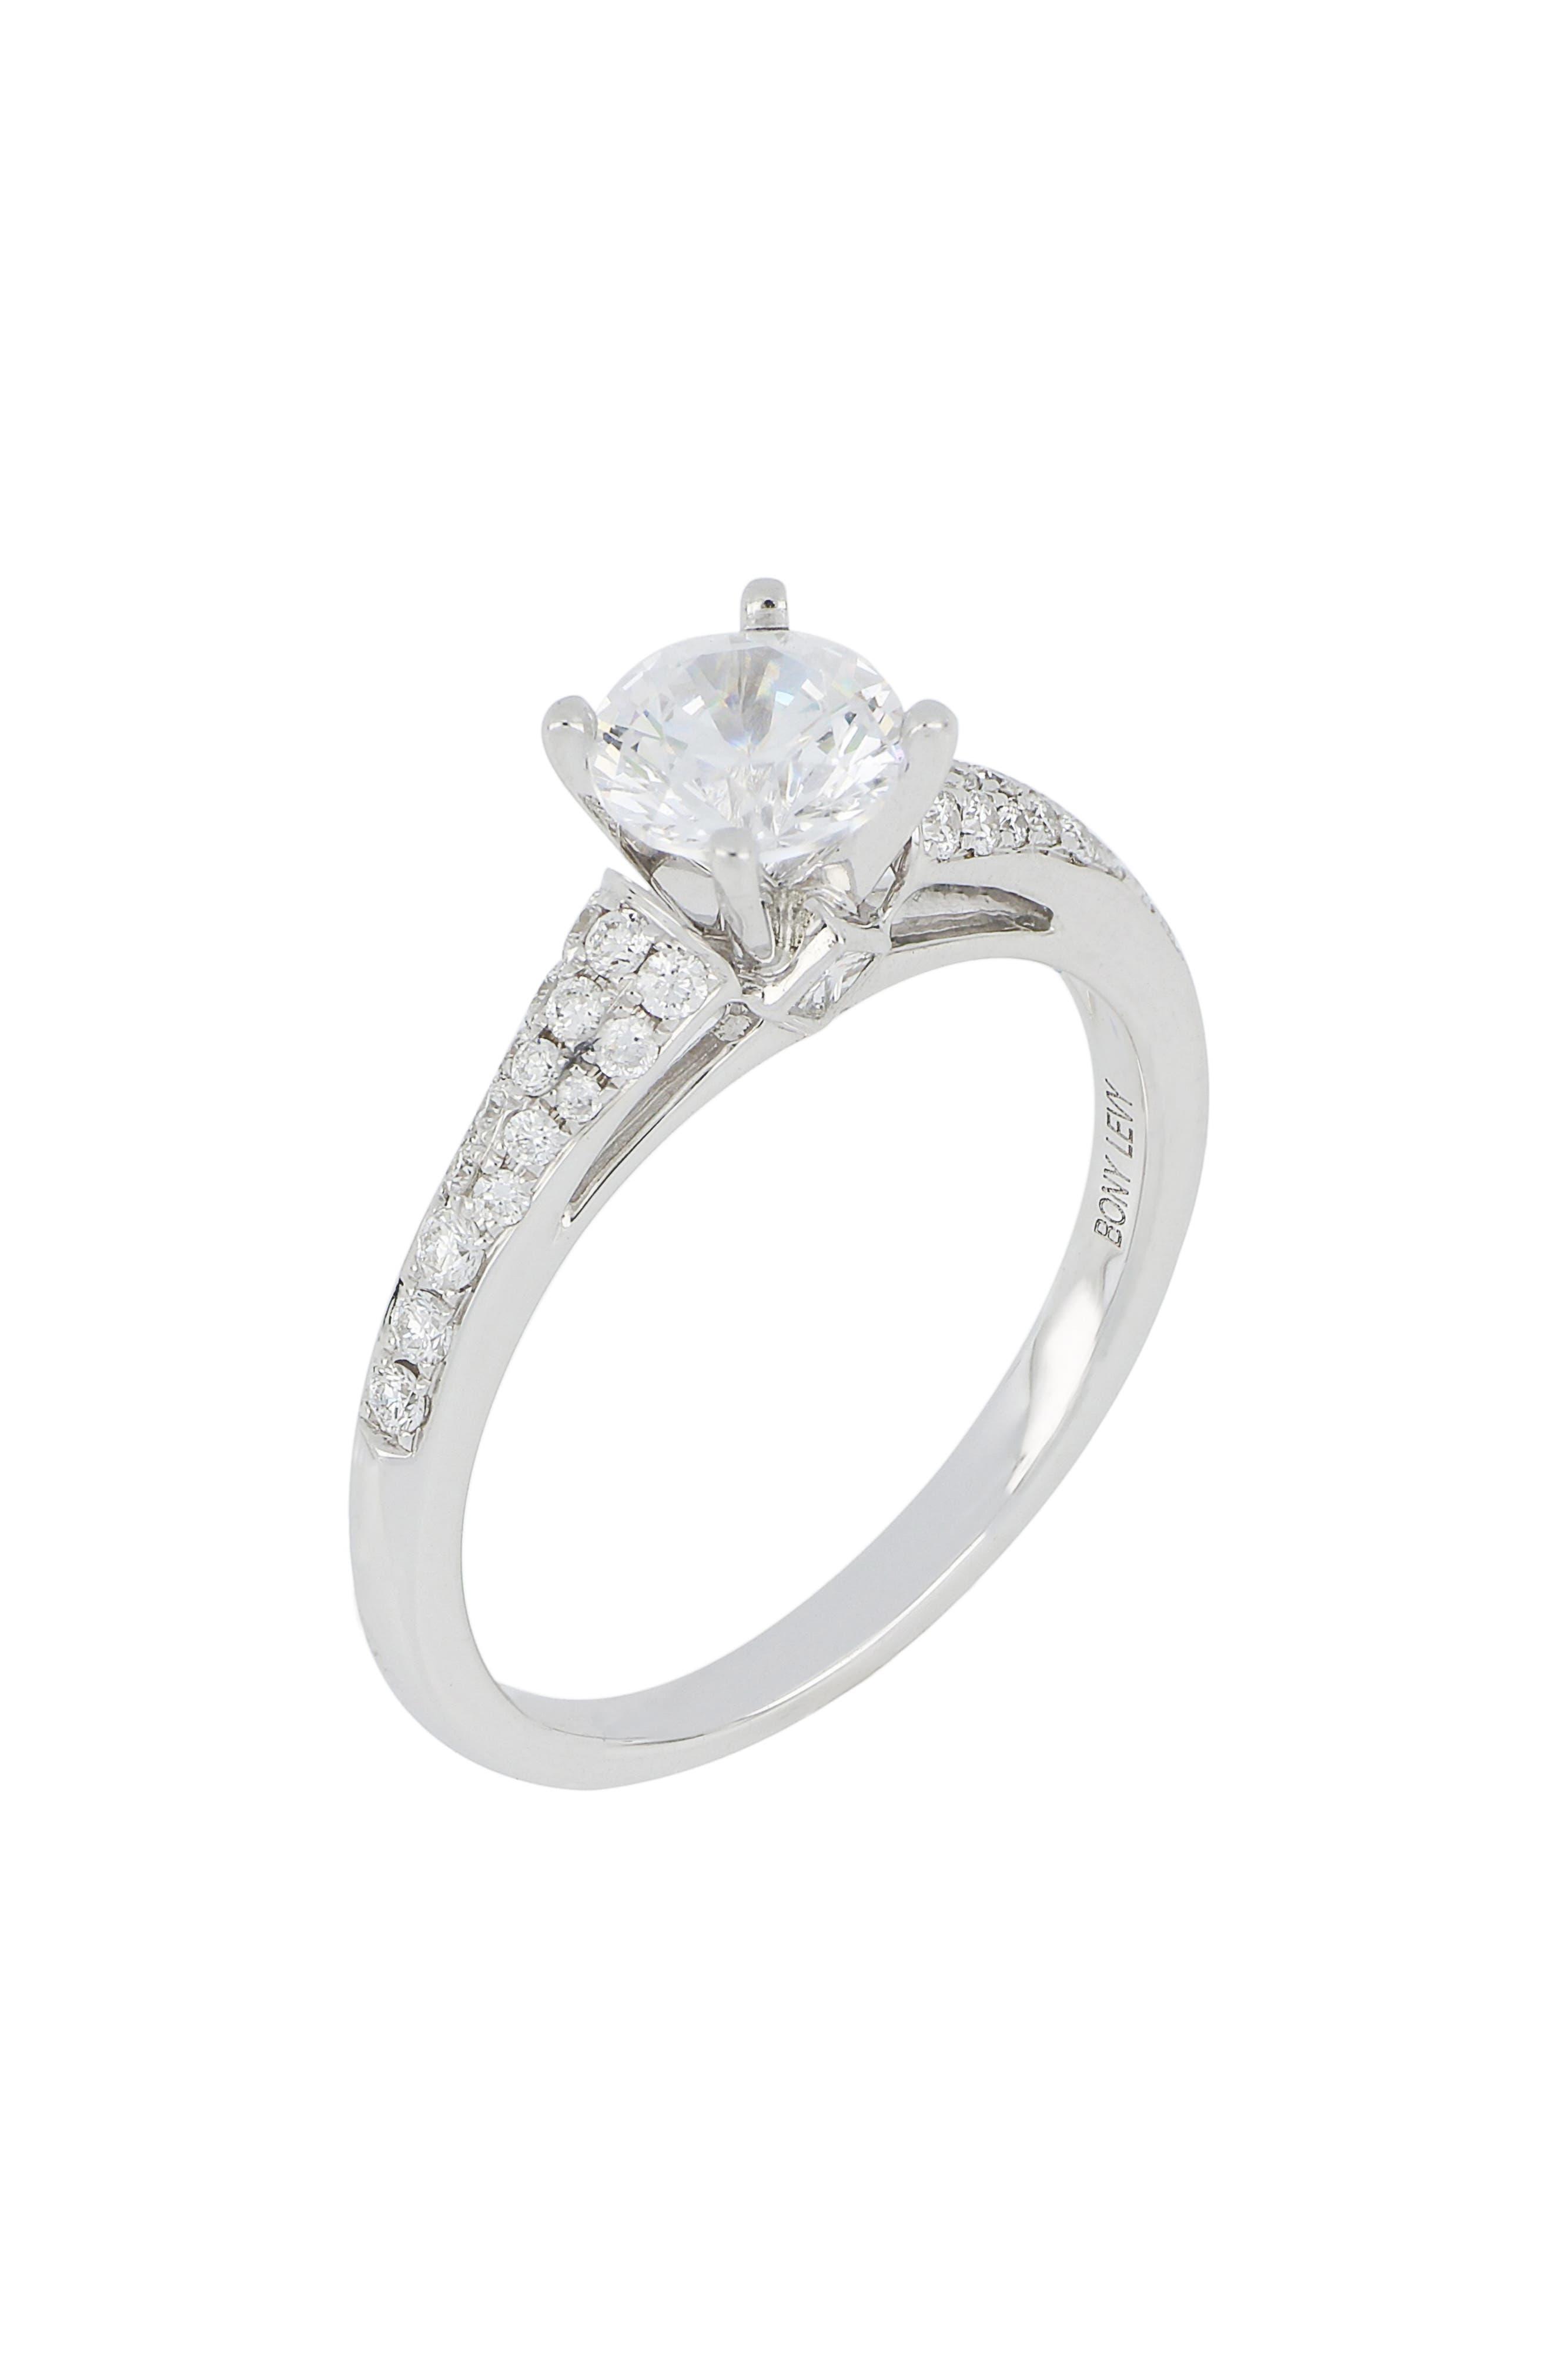 Pavé Diamond & Cubic Zirconia Four Prong Solitaire Ring,                             Main thumbnail 1, color,                             WHITE GOLD